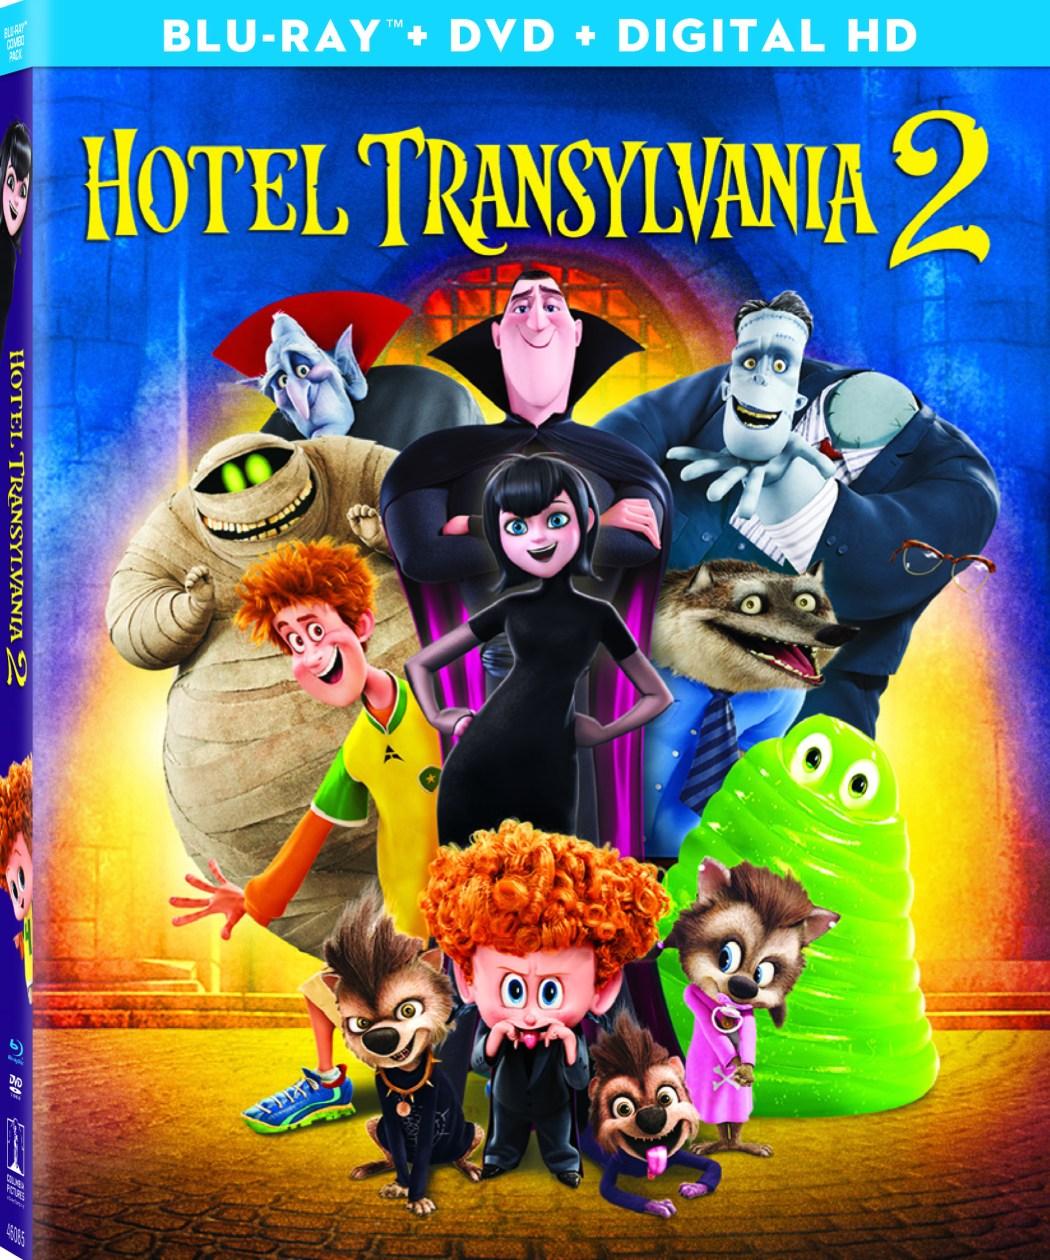 HOTEL TRANSYLVANIA 2_BDDVD-23D.JPG